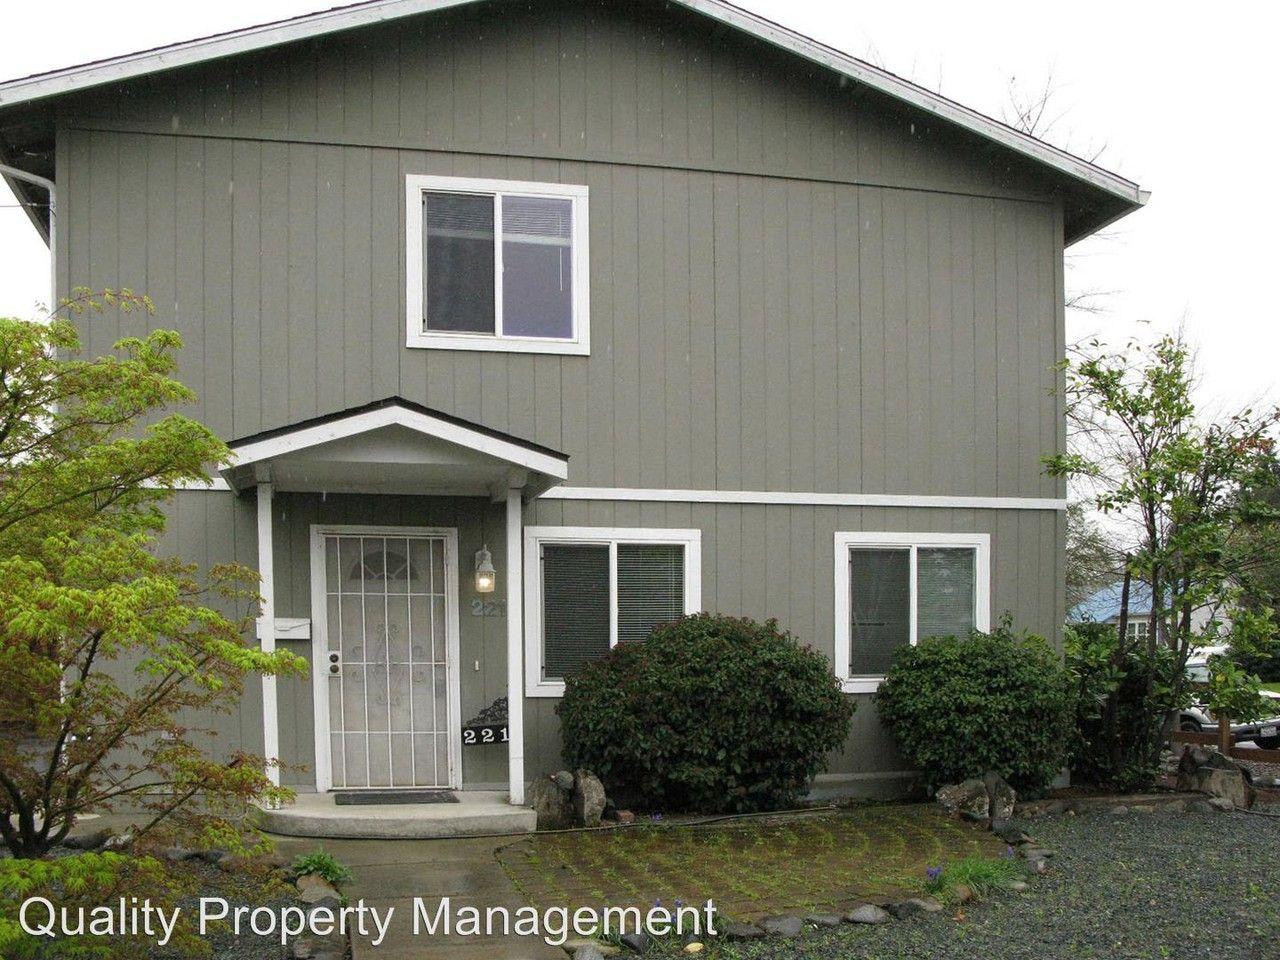 221 Monroe St, Medford, OR 97501 3 Bedroom House for Rent ...